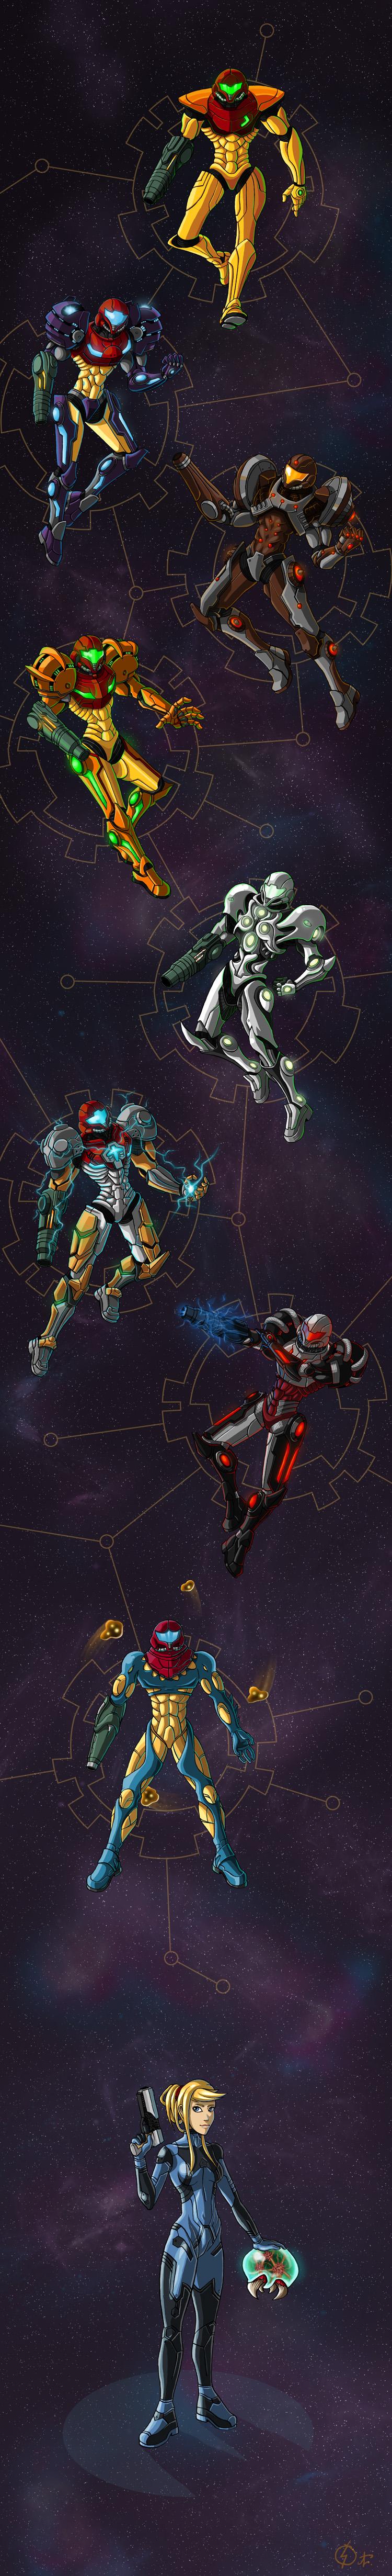 Metroid : Armored Heart by Arrarra